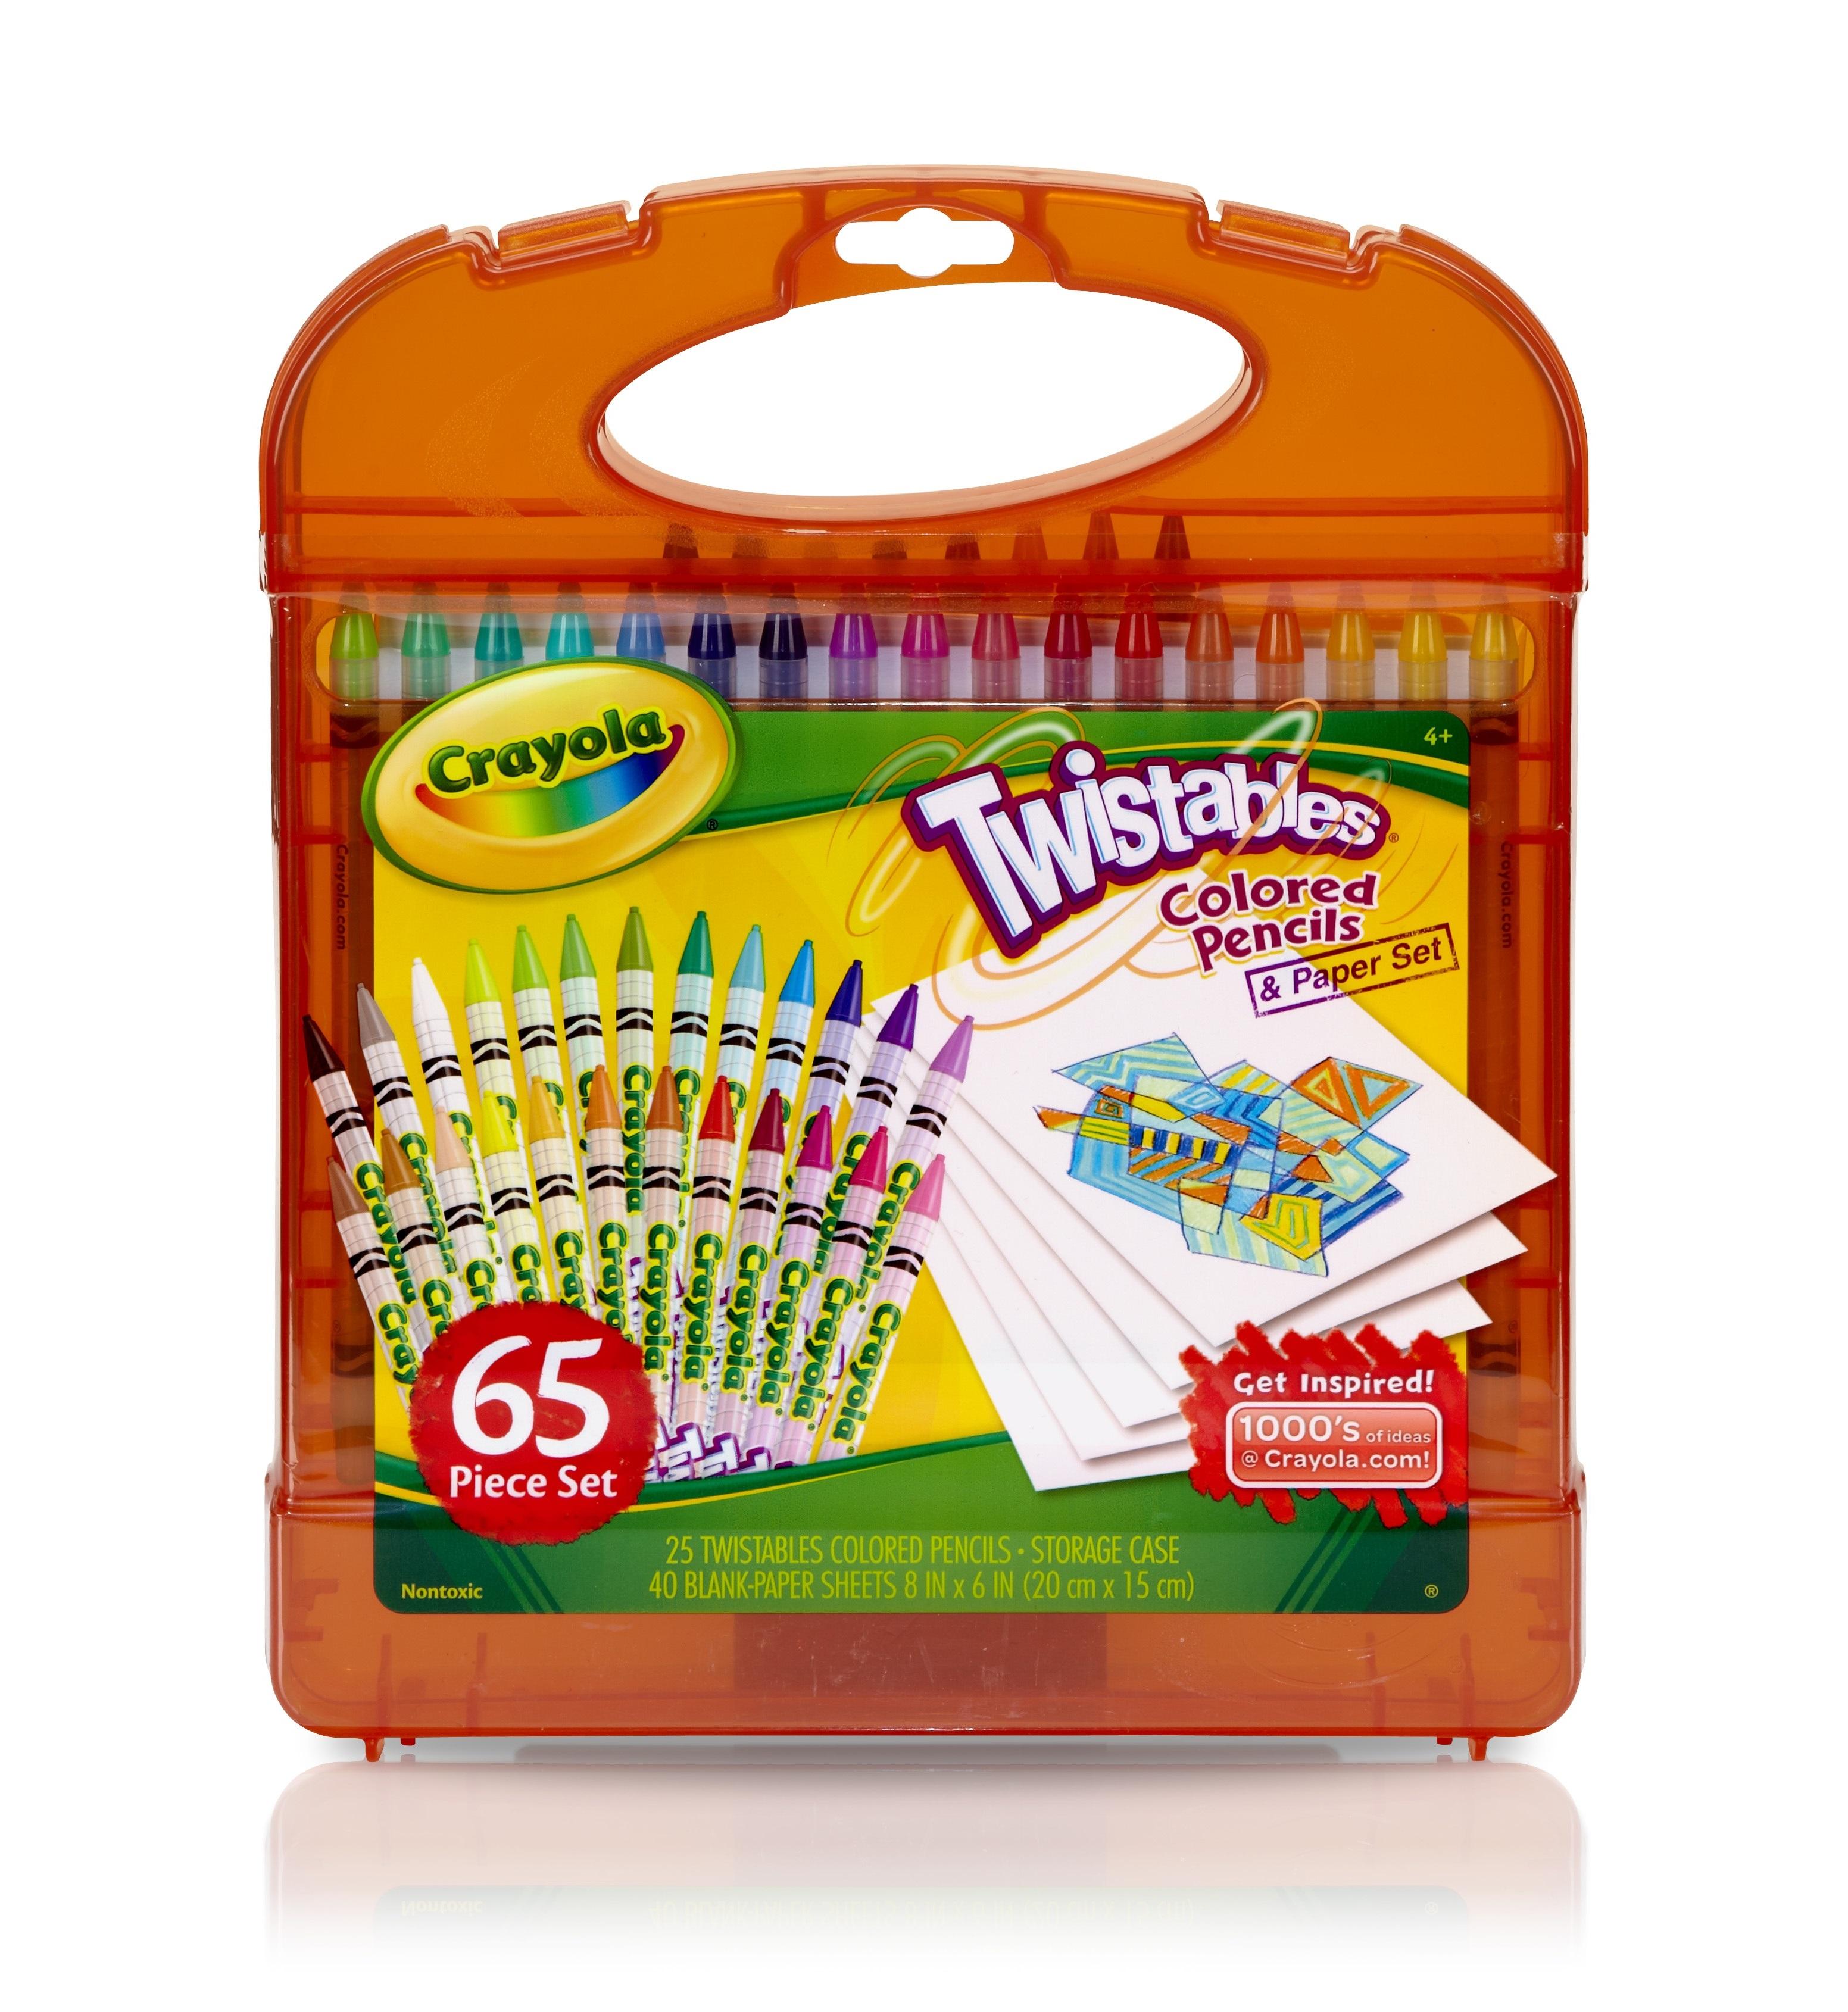 Crayola Twistable Colored Pencils Paper Set 65 piece set 25